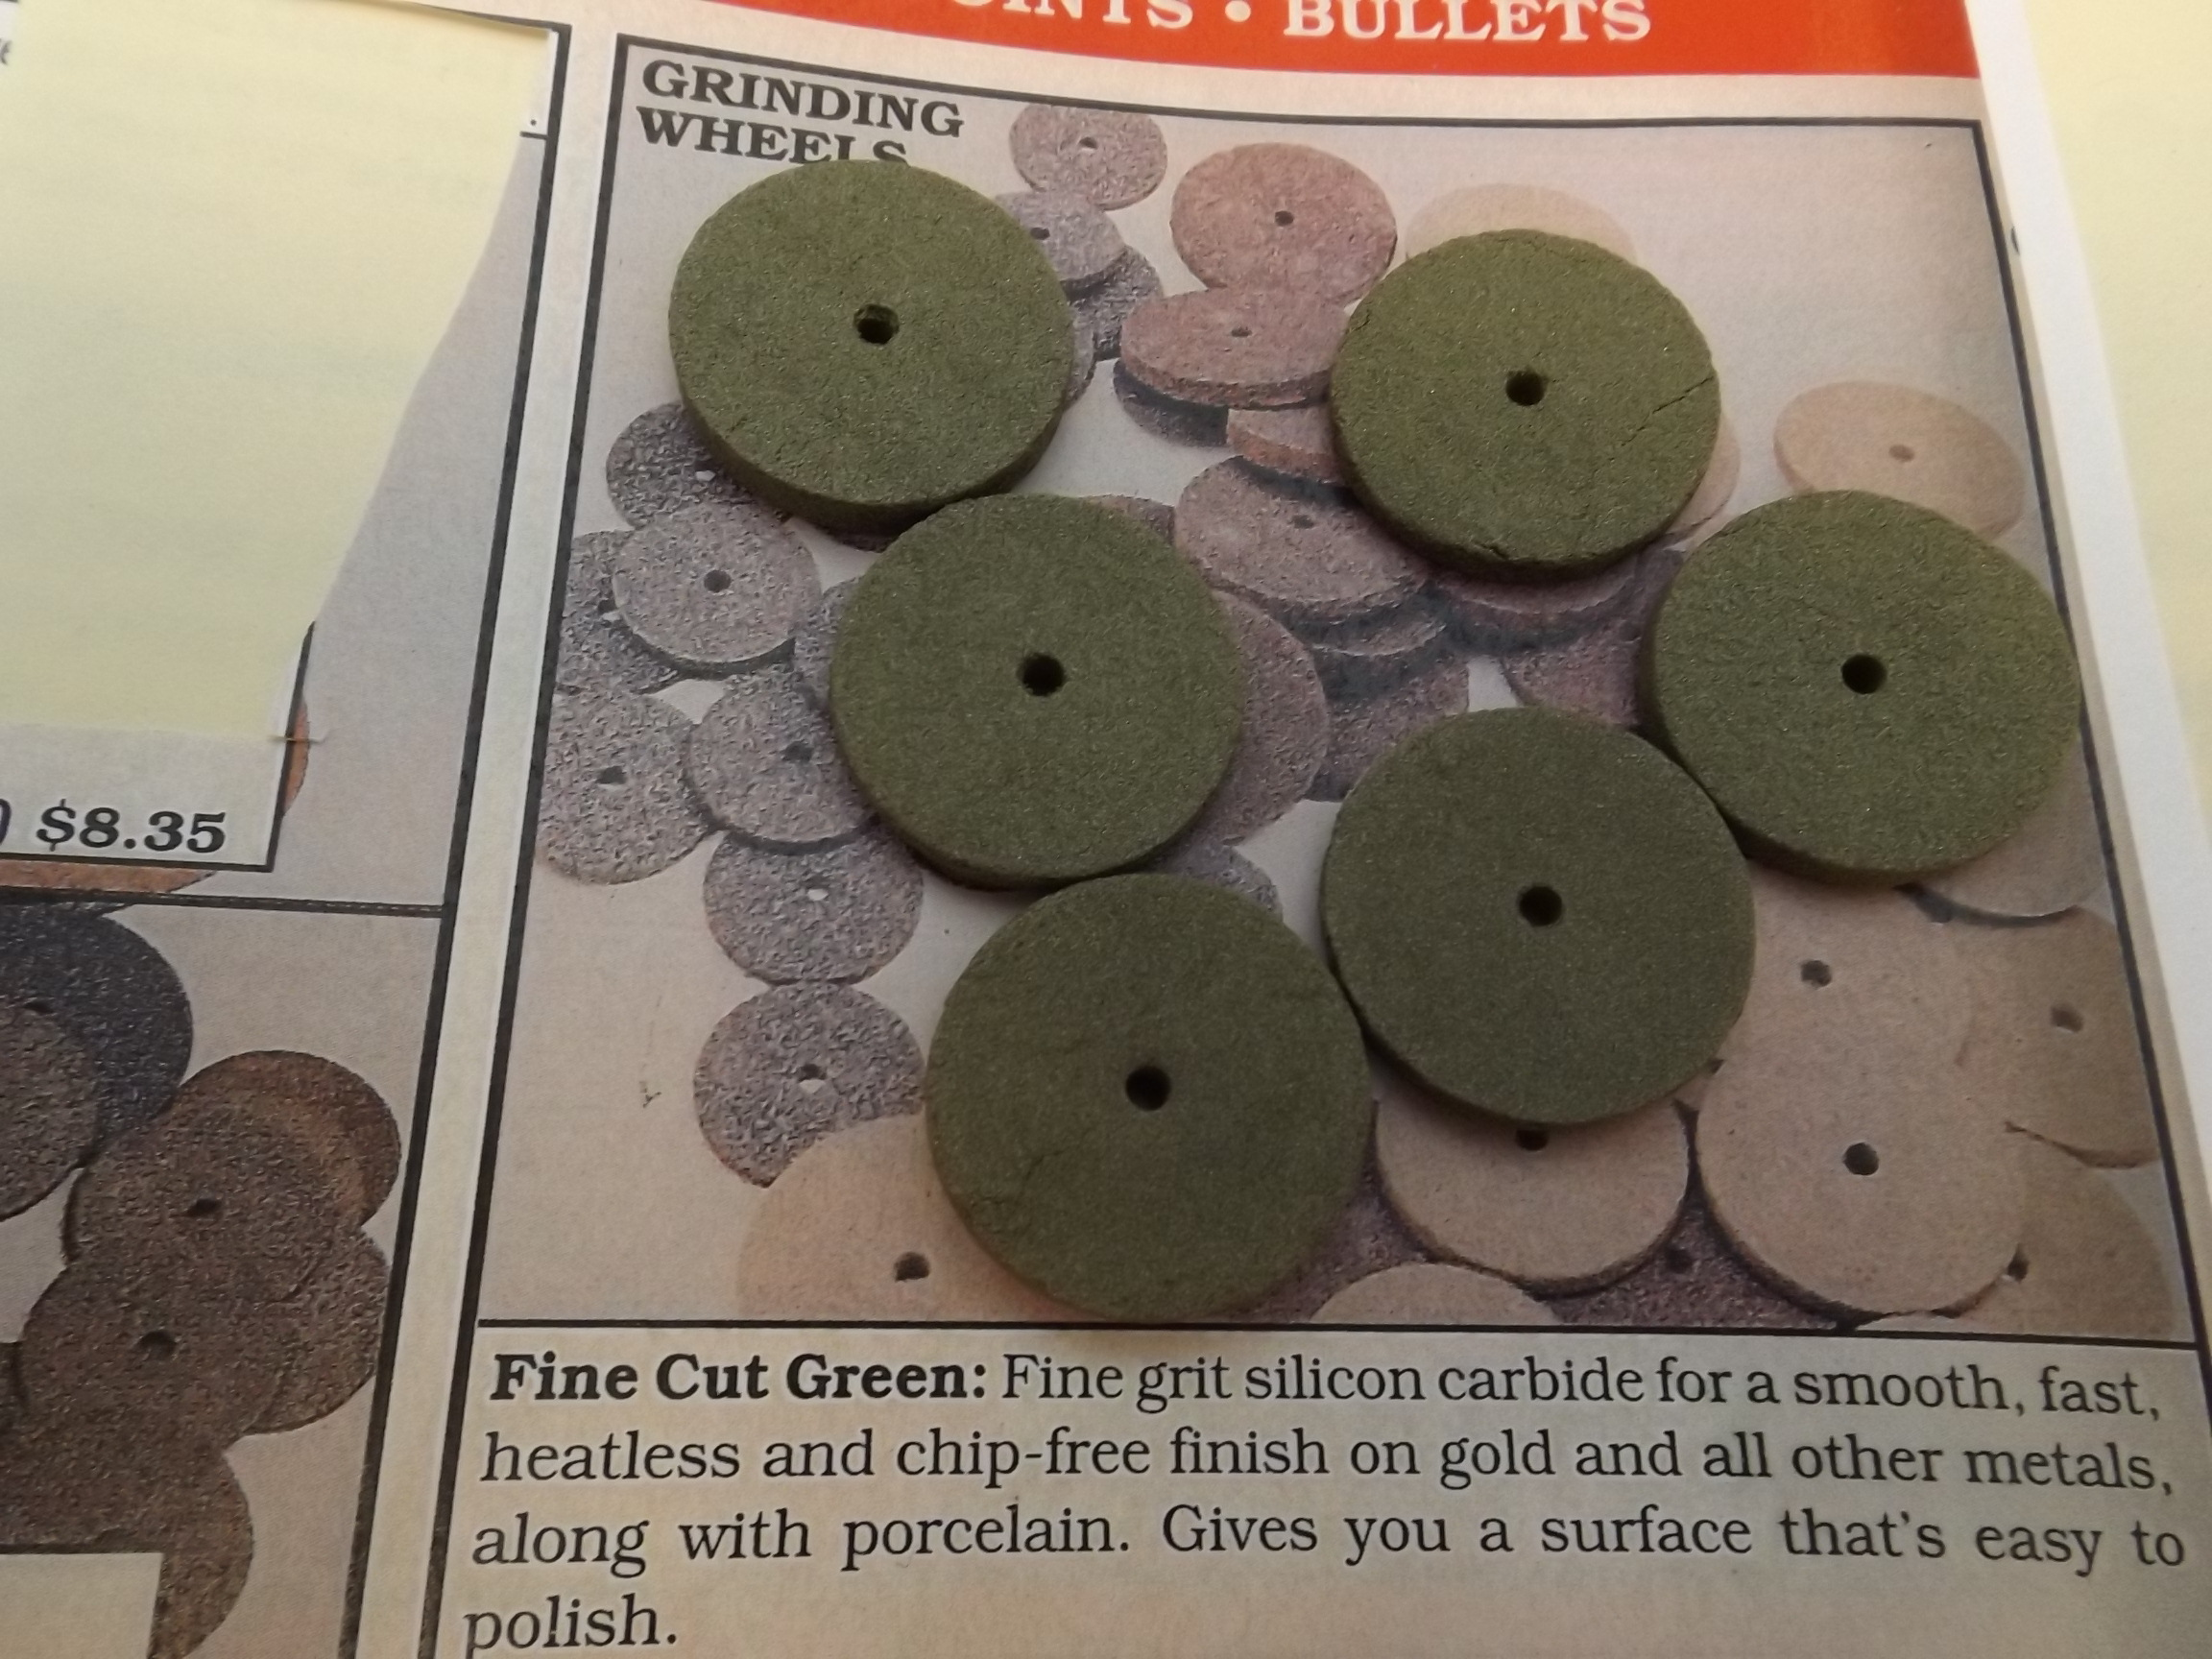 "ST1320 Fine Cut Green Grinding Wheels-- 7/8"" x 1/8""- bx of 100 Last Box! Grobet 11.786"